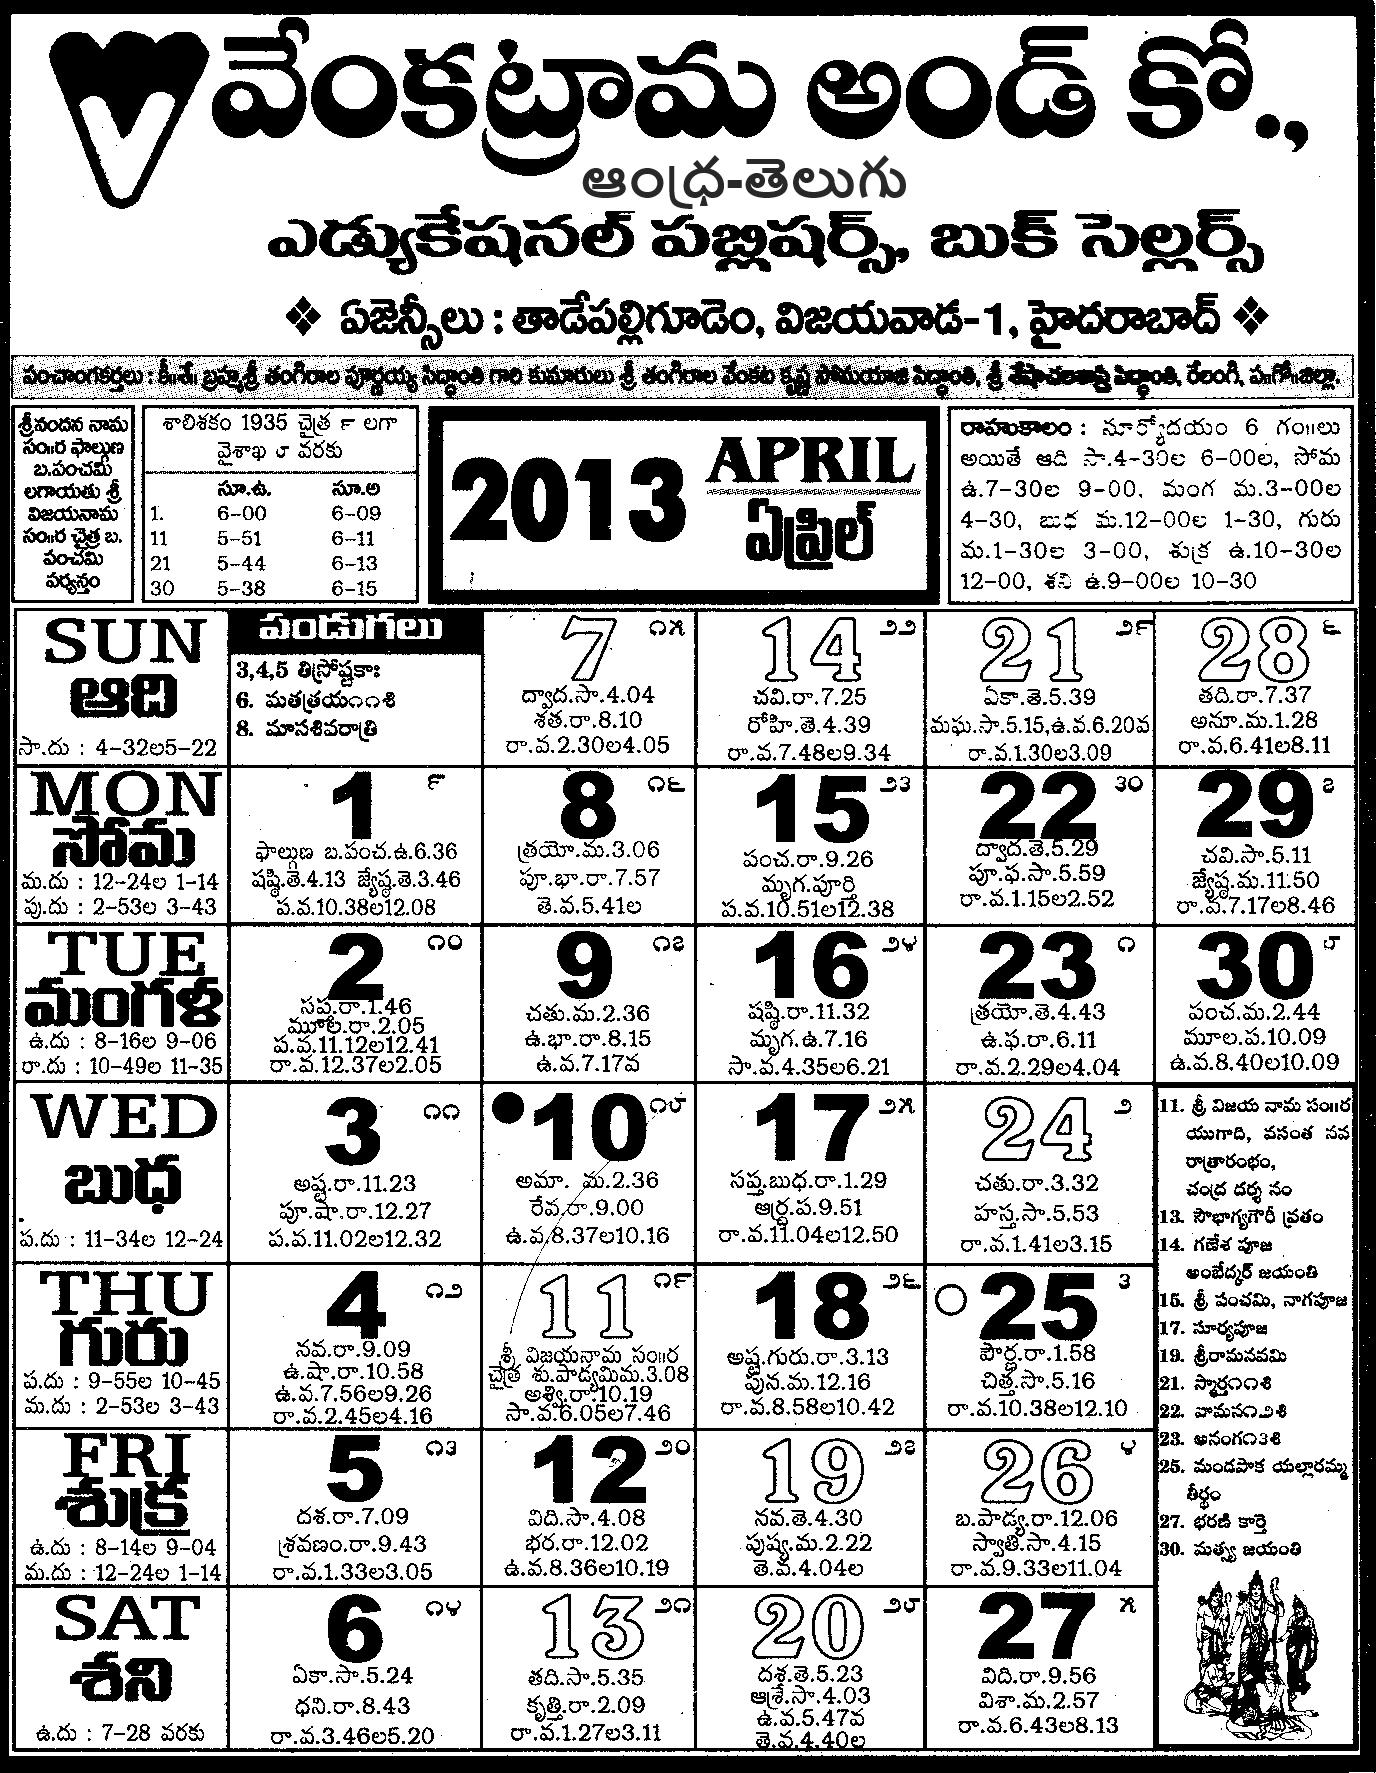 Telugu Calendar 1987 May | Search Results | Calendar 2015